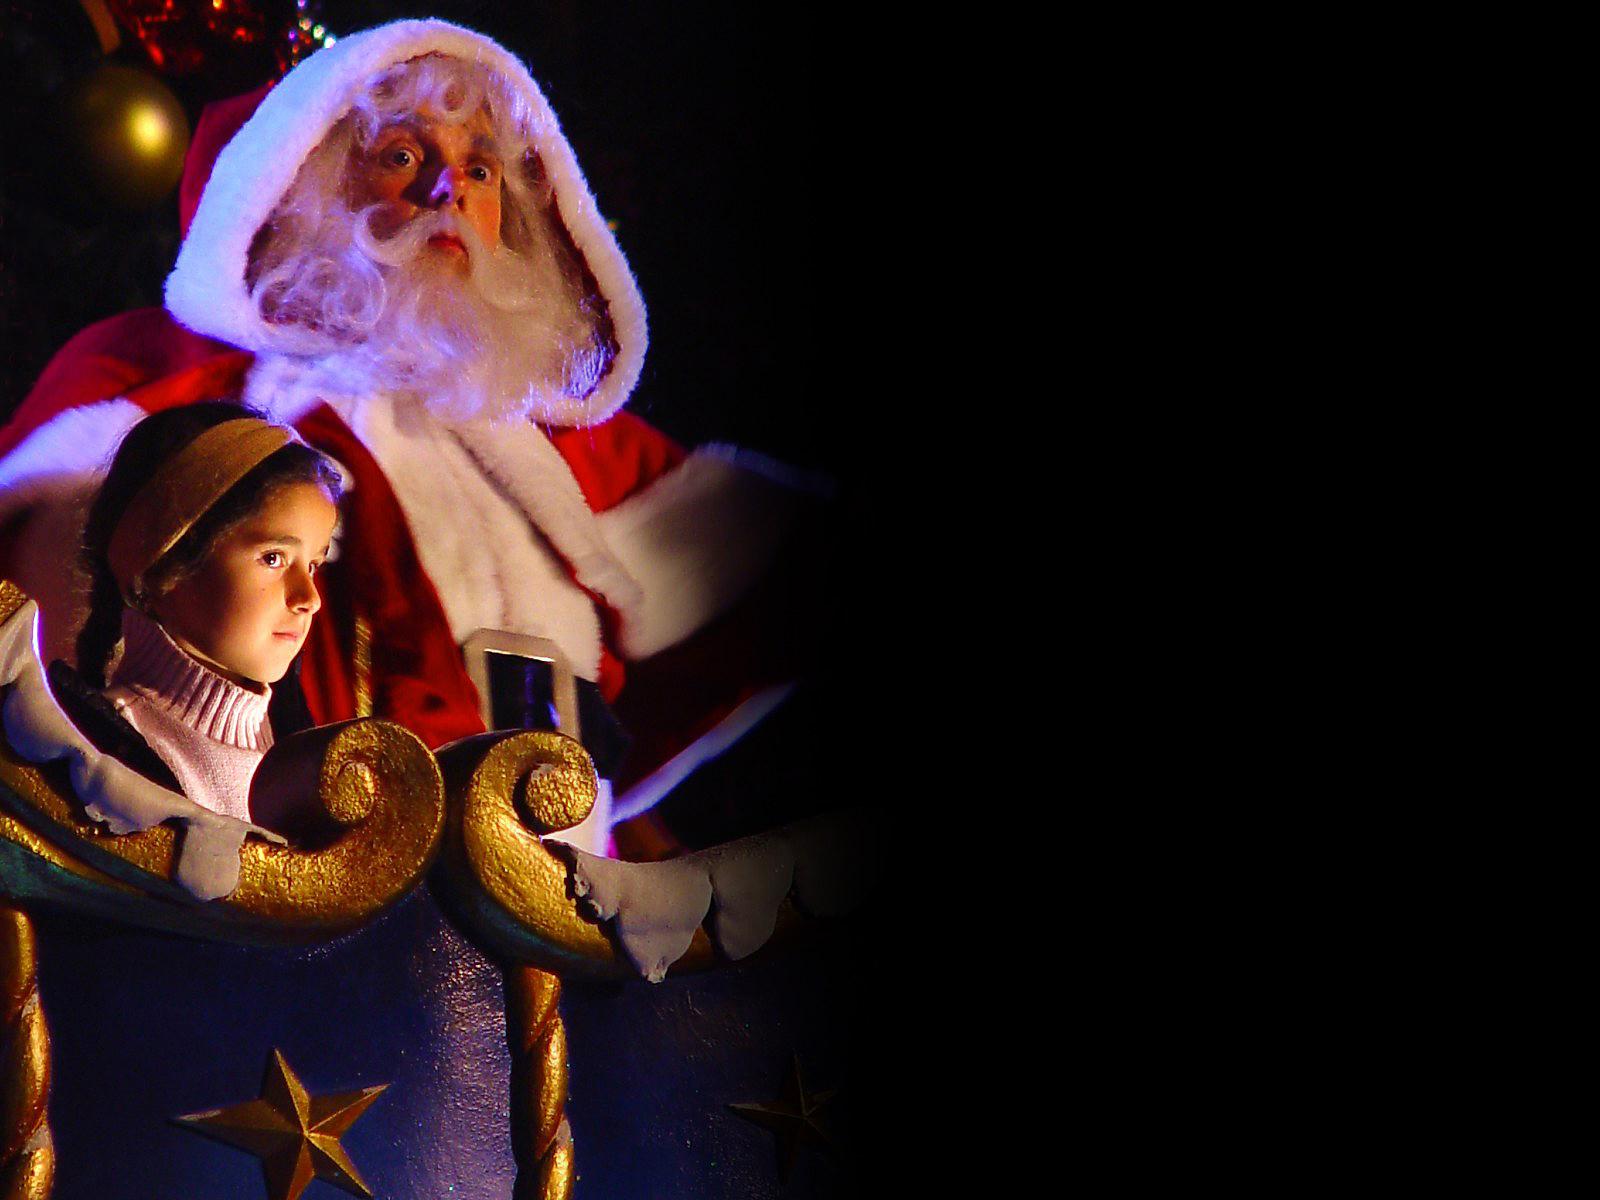 http://2.bp.blogspot.com/-TJSQ_-jUzZA/Tq_TFE8ZMXI/AAAAAAAAP3I/6FHSAxZo9wE/s1600/Mooie-kerstman-achtergronden-leuke-kerstman-wallpapers-afbeelding-plaatje-foto-21.jpg